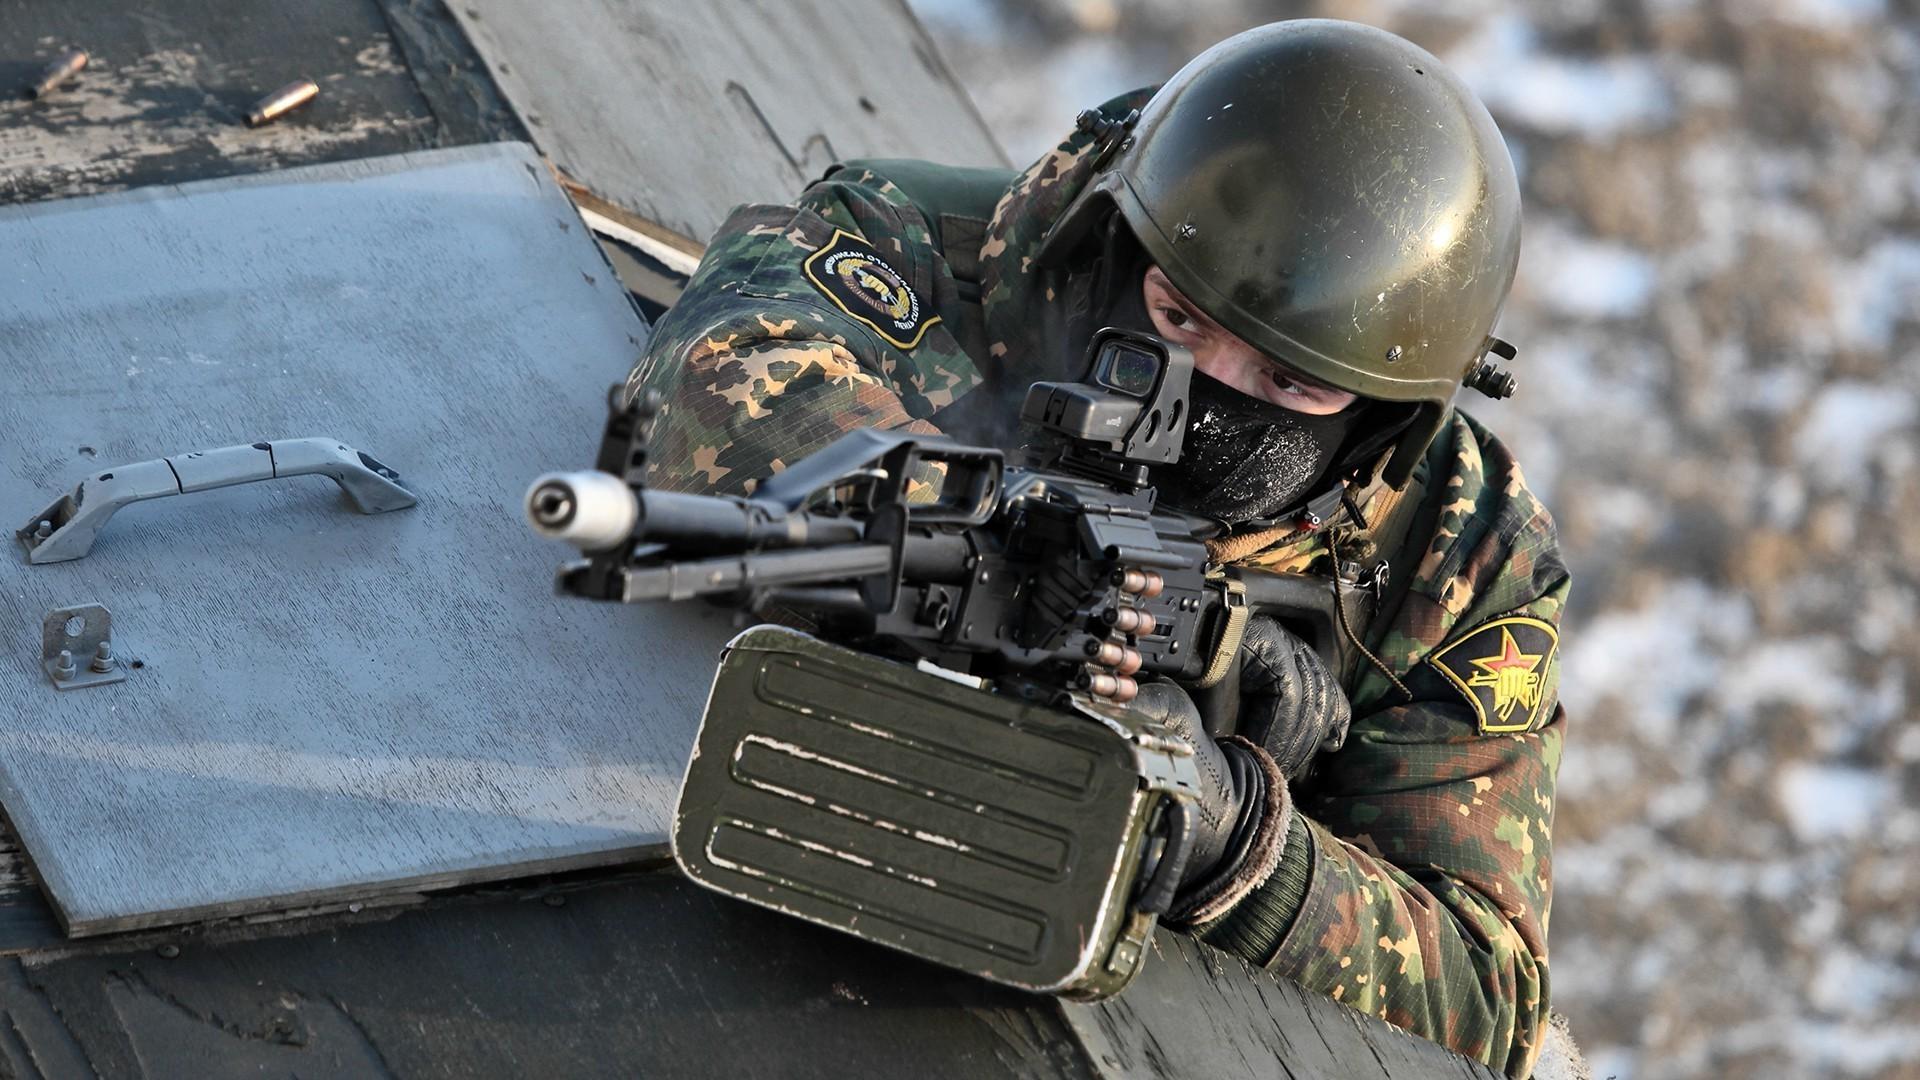 1920x1080 Soldier Men PKP Pecheneg Machine Gun Weapon Spetsnaz Russian